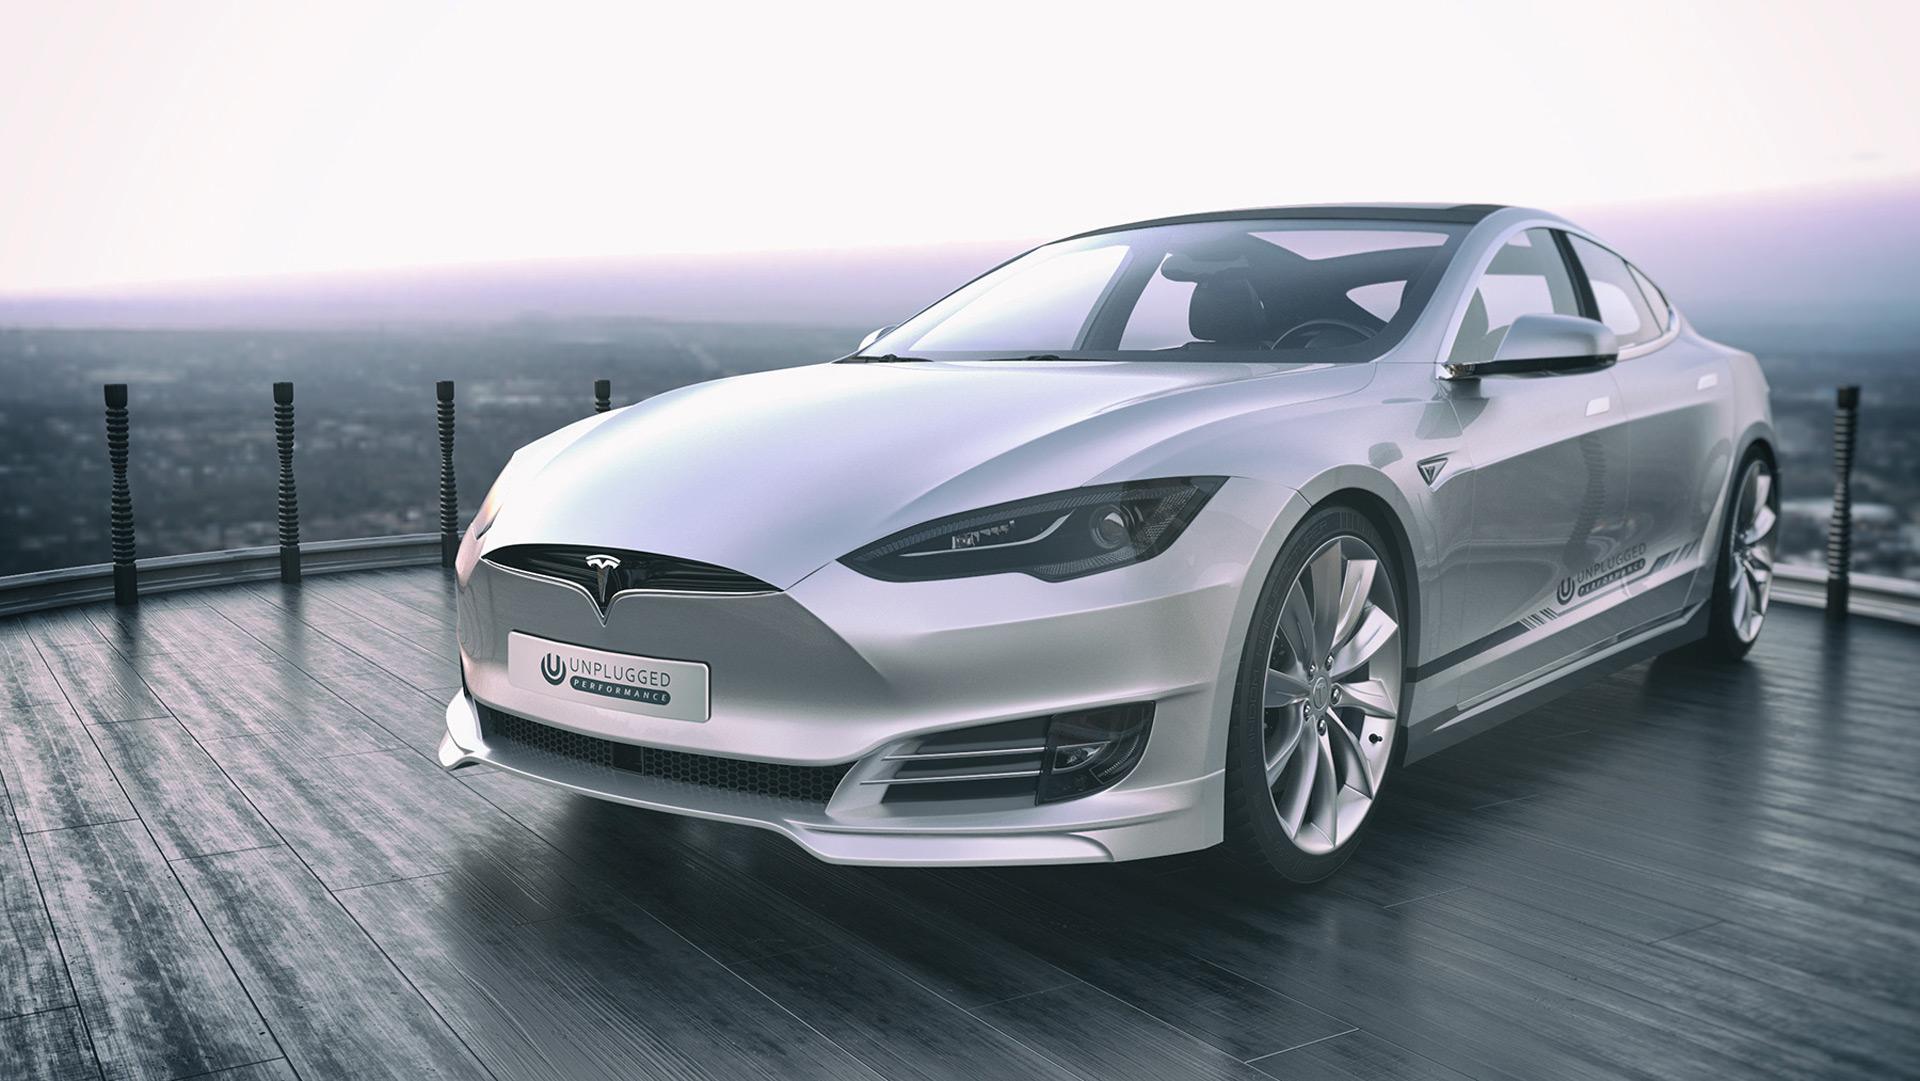 Tesla Model S body upgrade kit makes older cars look like